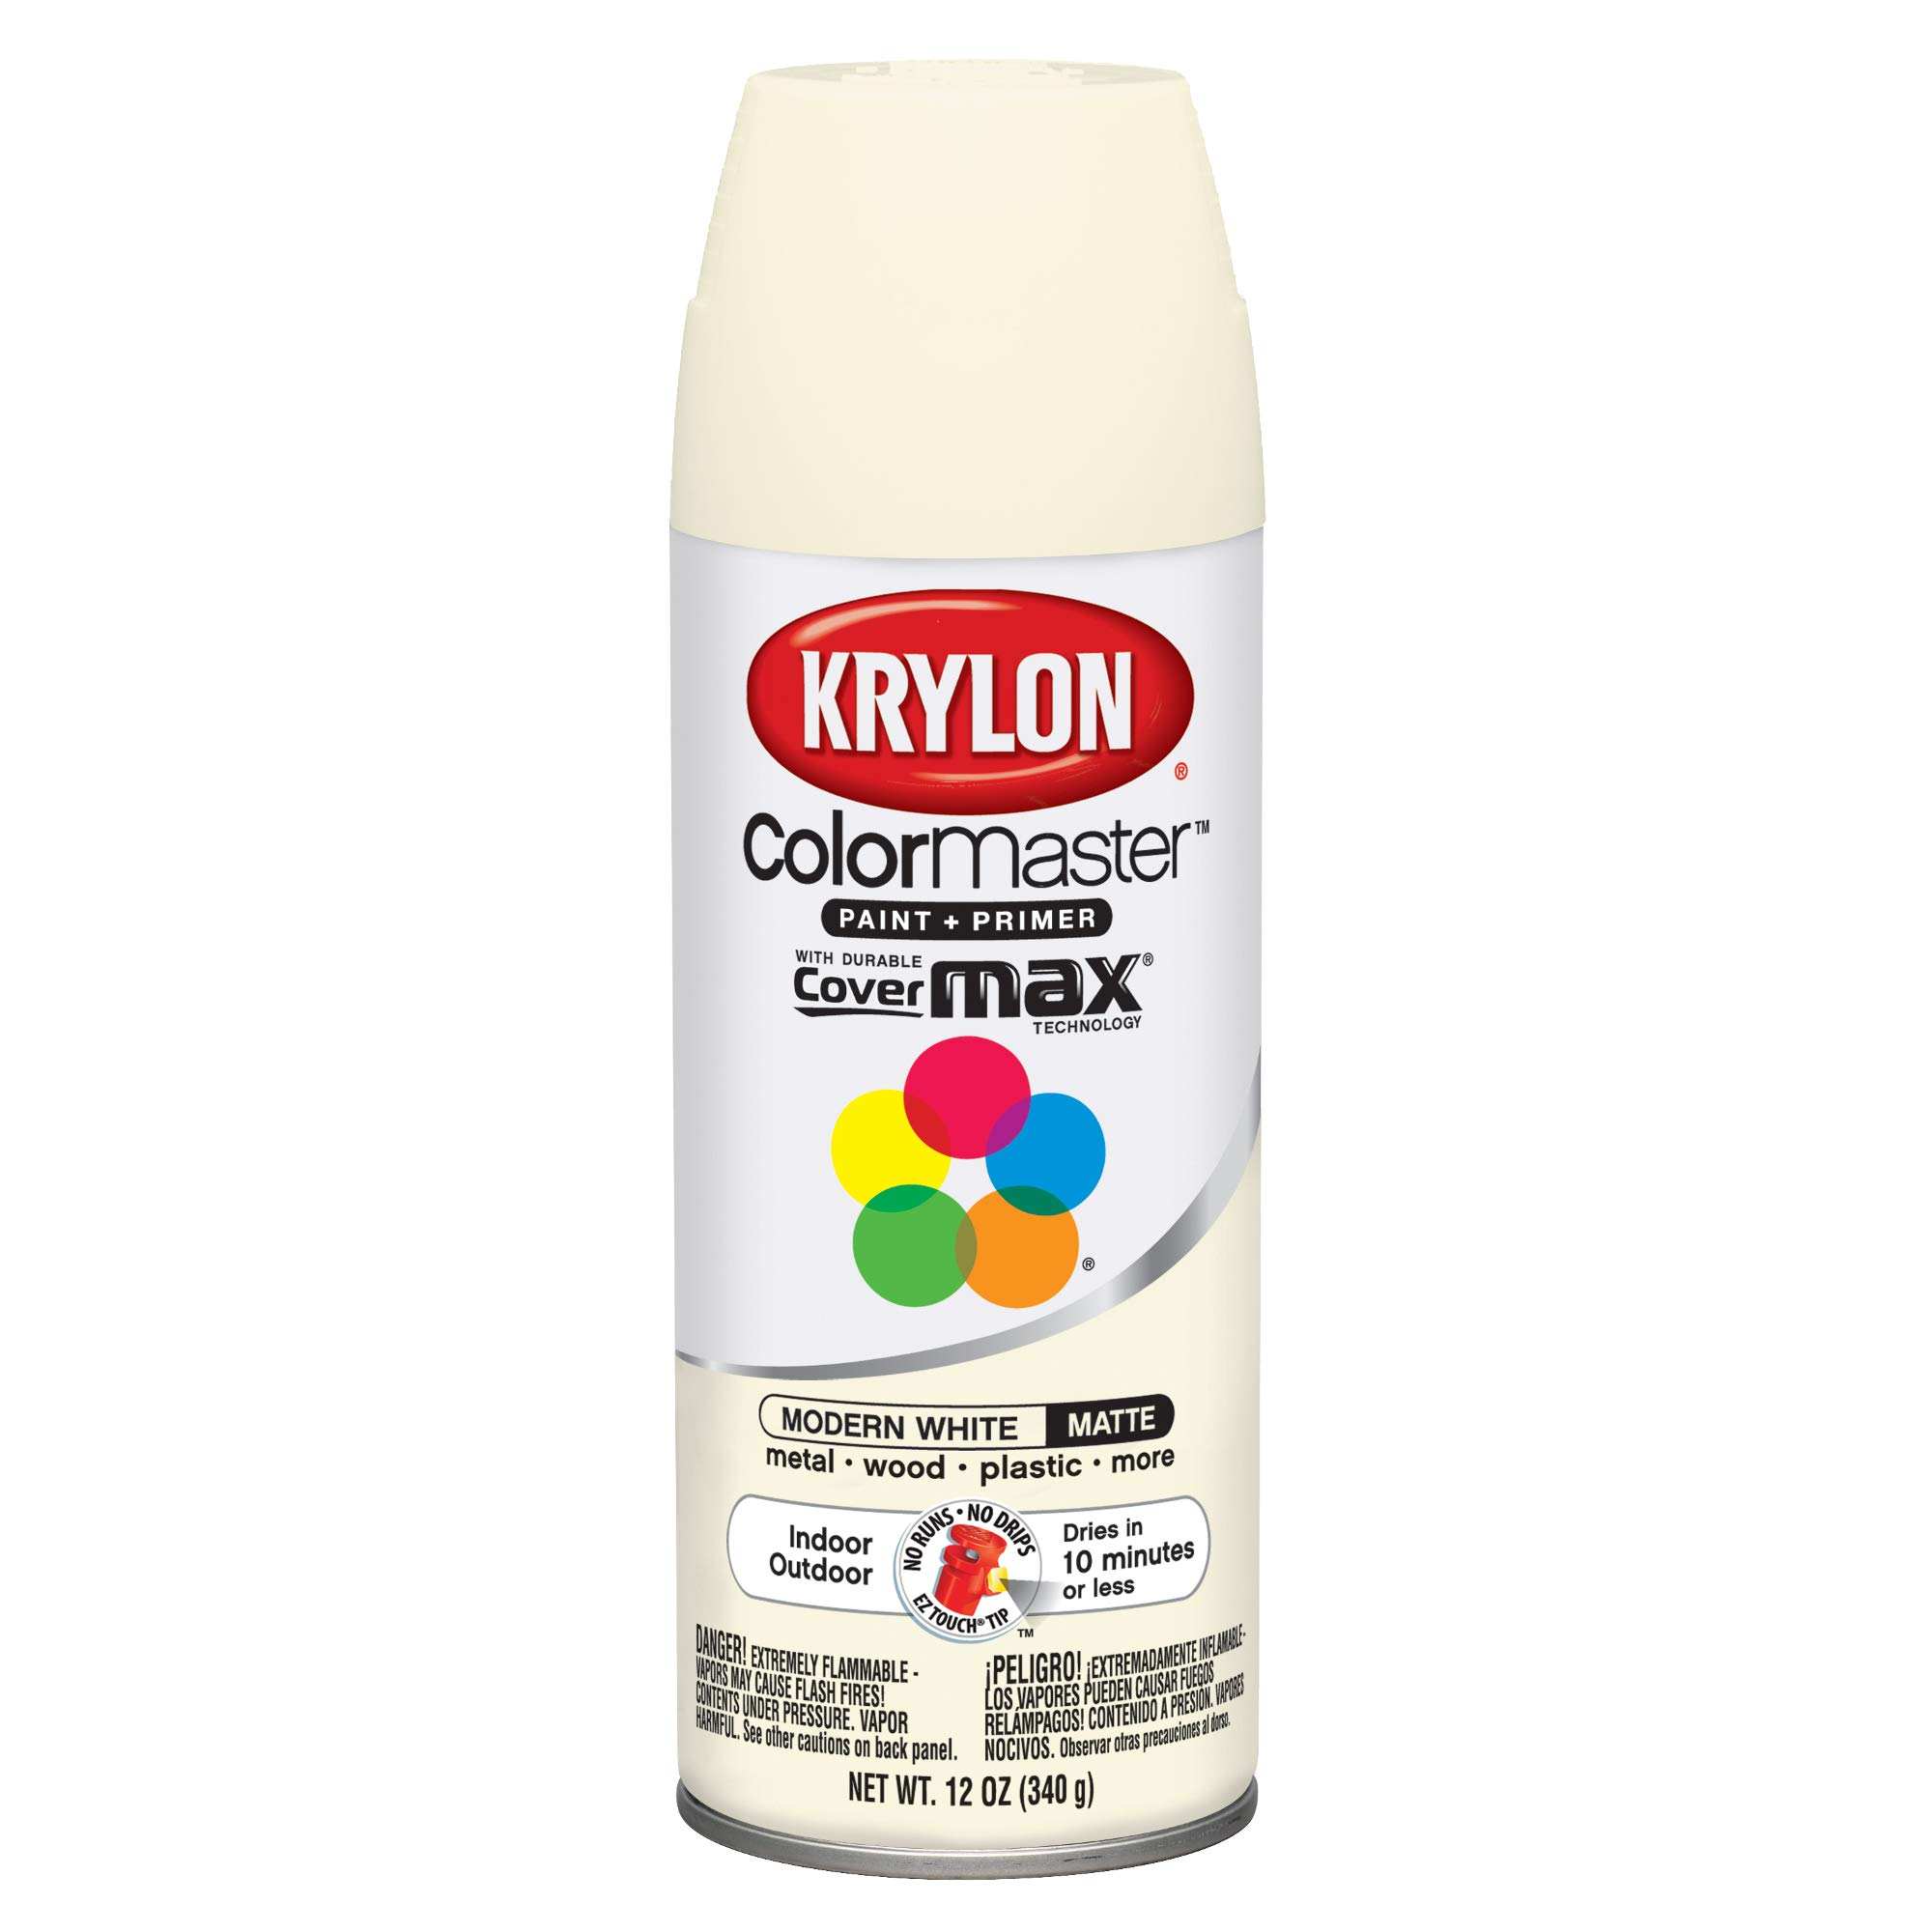 Krylon K05358007 ColorMaster Primer Aerosol Paints, 12 oz, Modern White